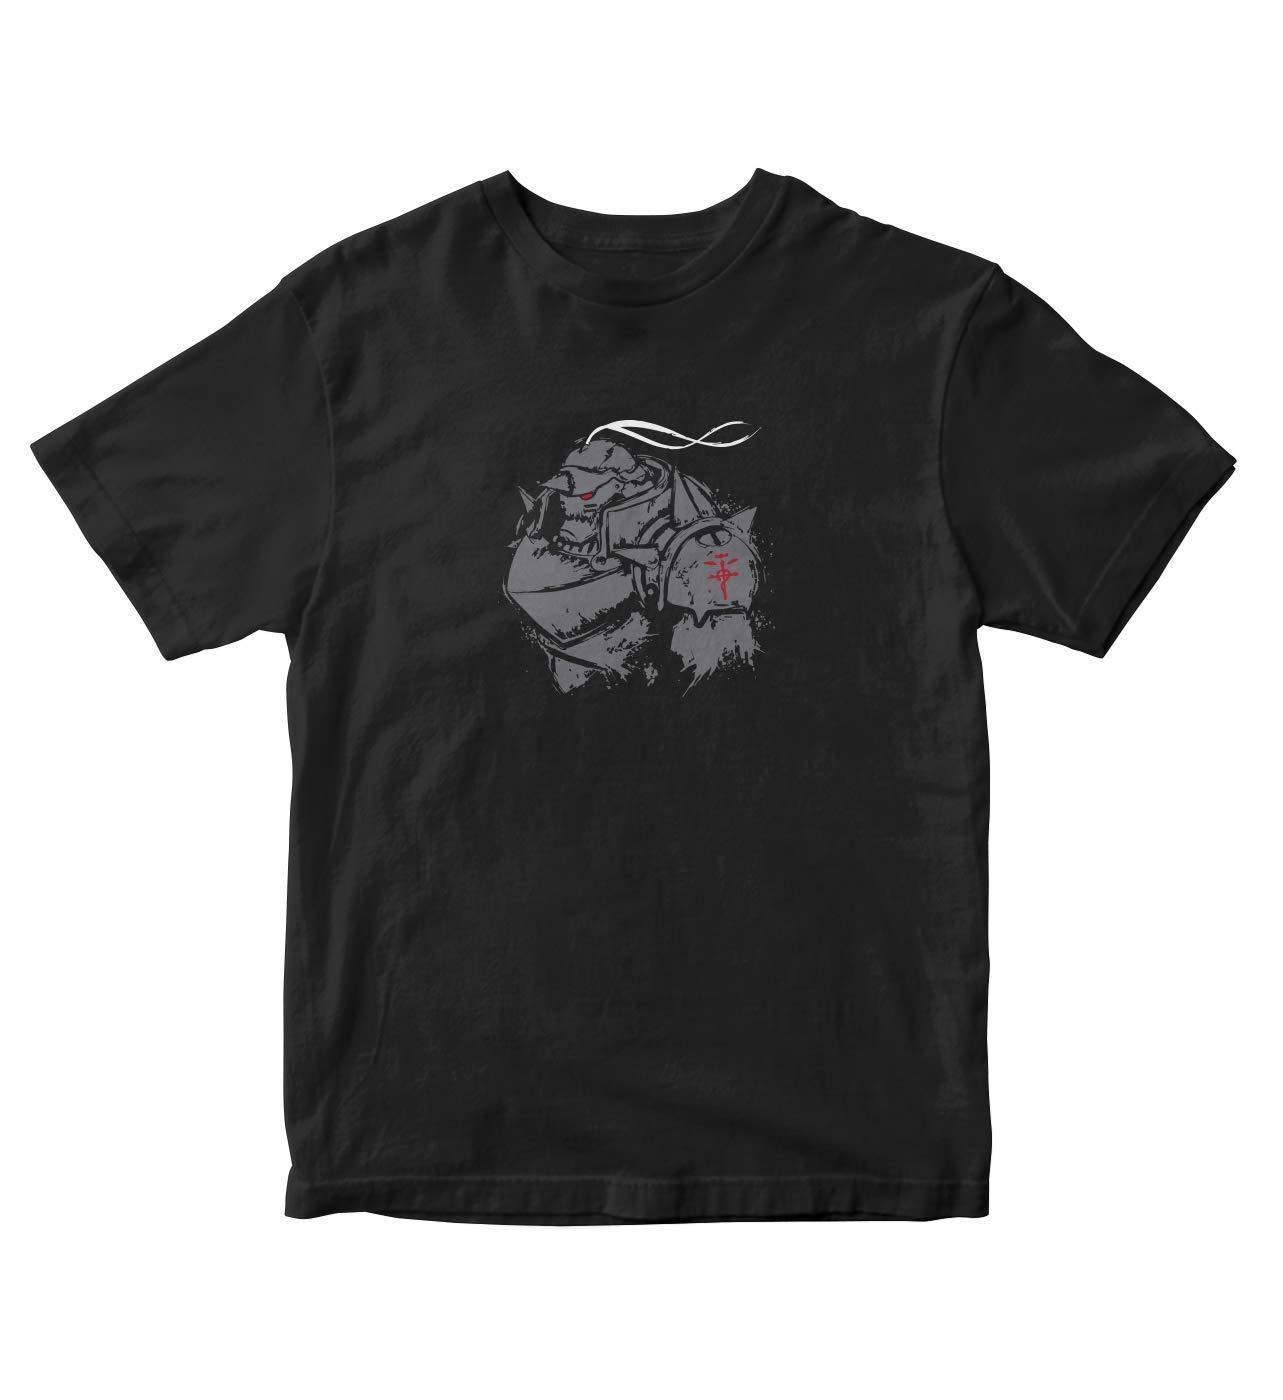 Fullmetal Alchemist Shirt Alphonse Elric Anime Manga S Black Shirt A784